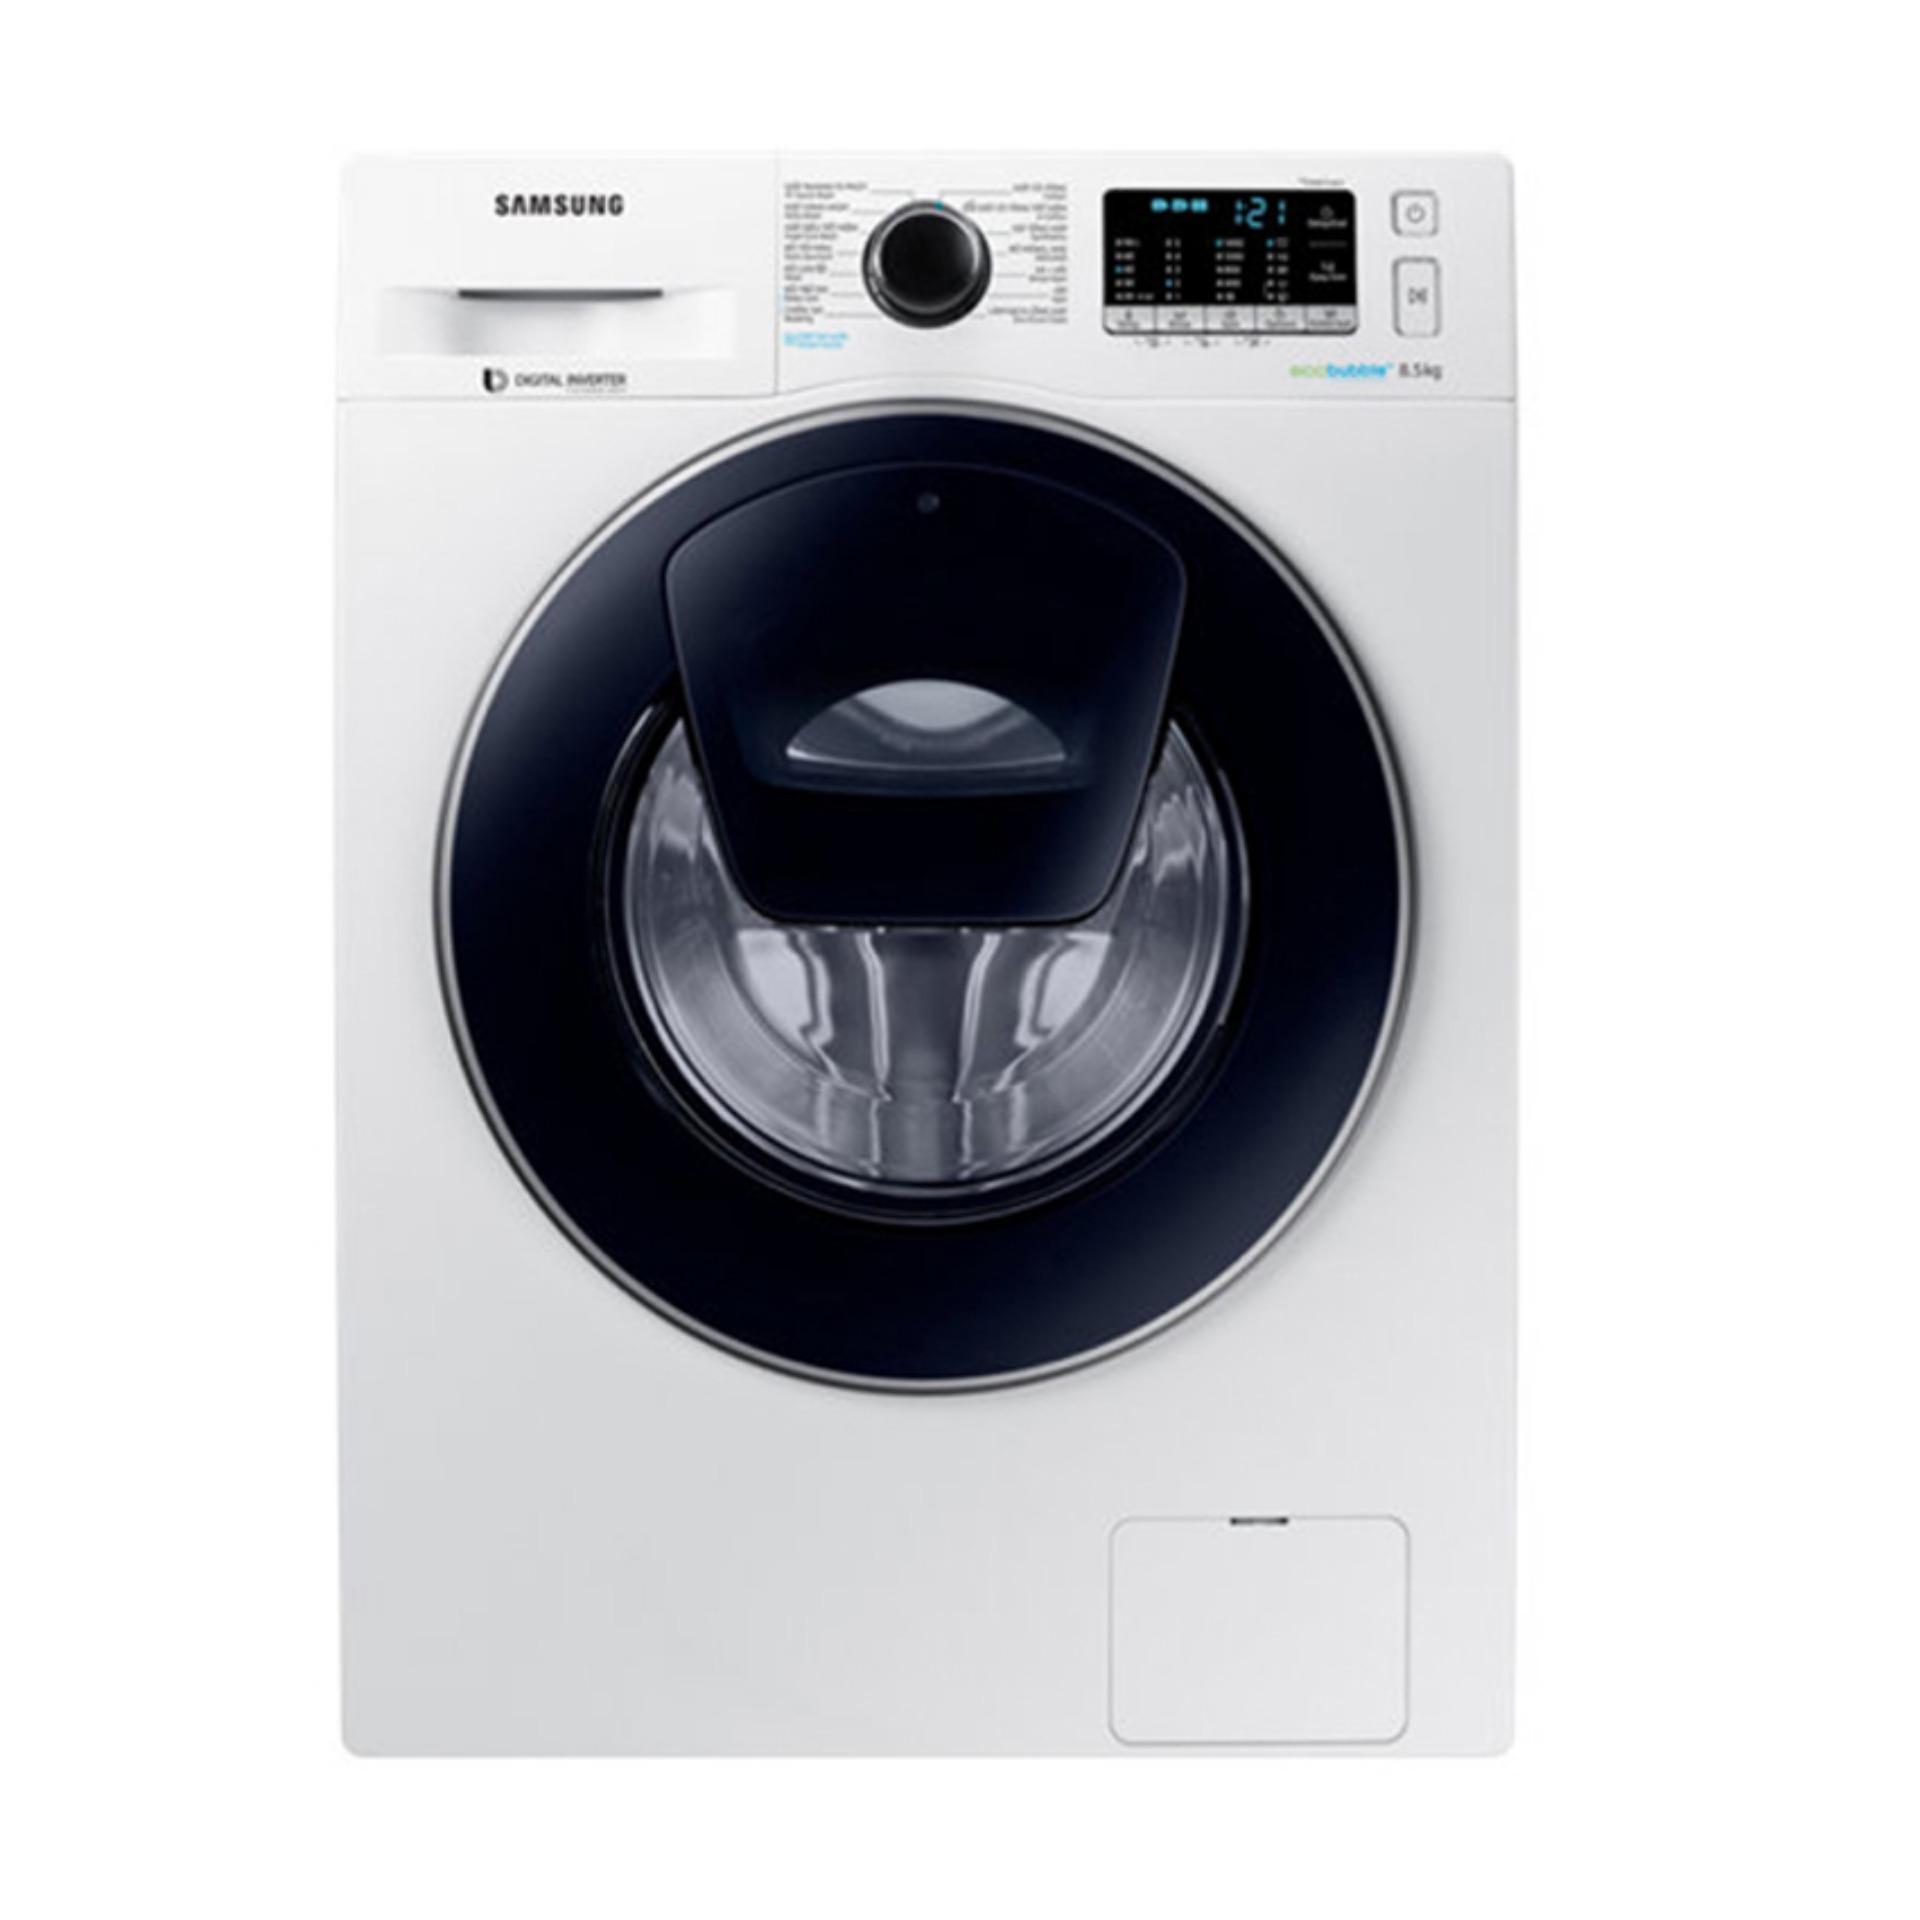 Máy giặt cửa trước AddWash Inverter Samsung WW85K54E0UW/SV 8.5kg (Trắng)